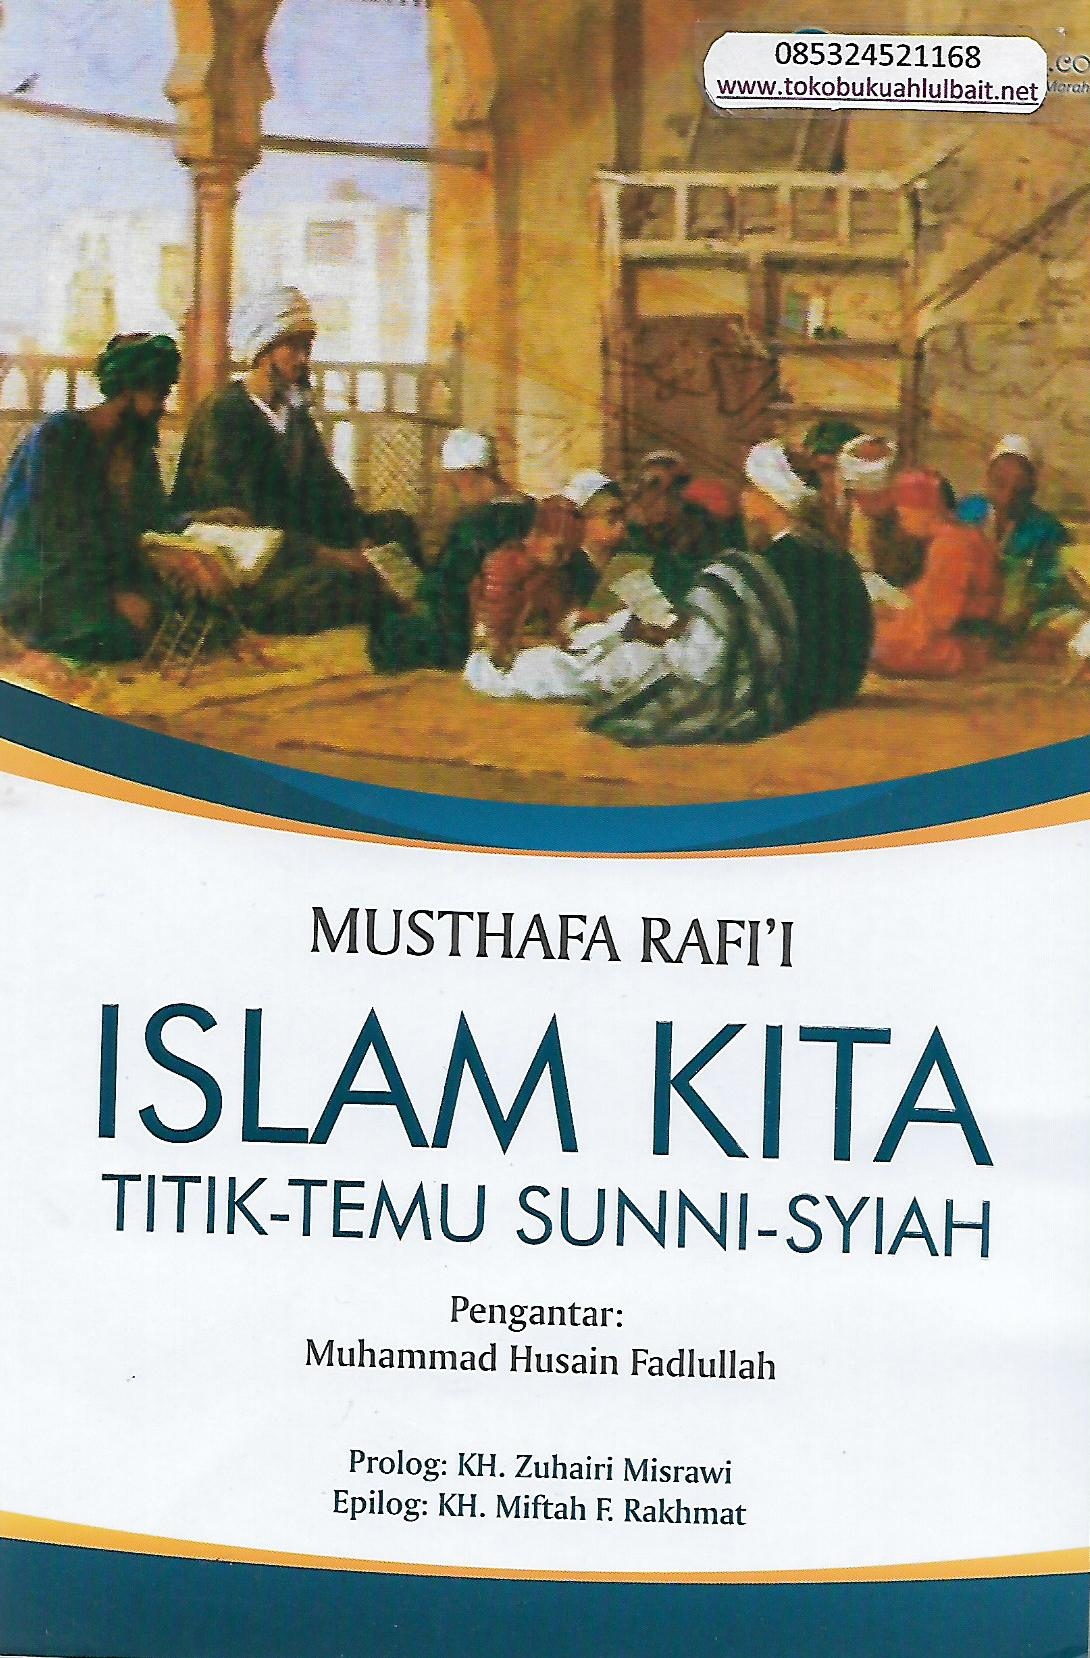 Bazar AB - Islam kita titik temu Sunni syiah | Jual Beli Komunitas AB